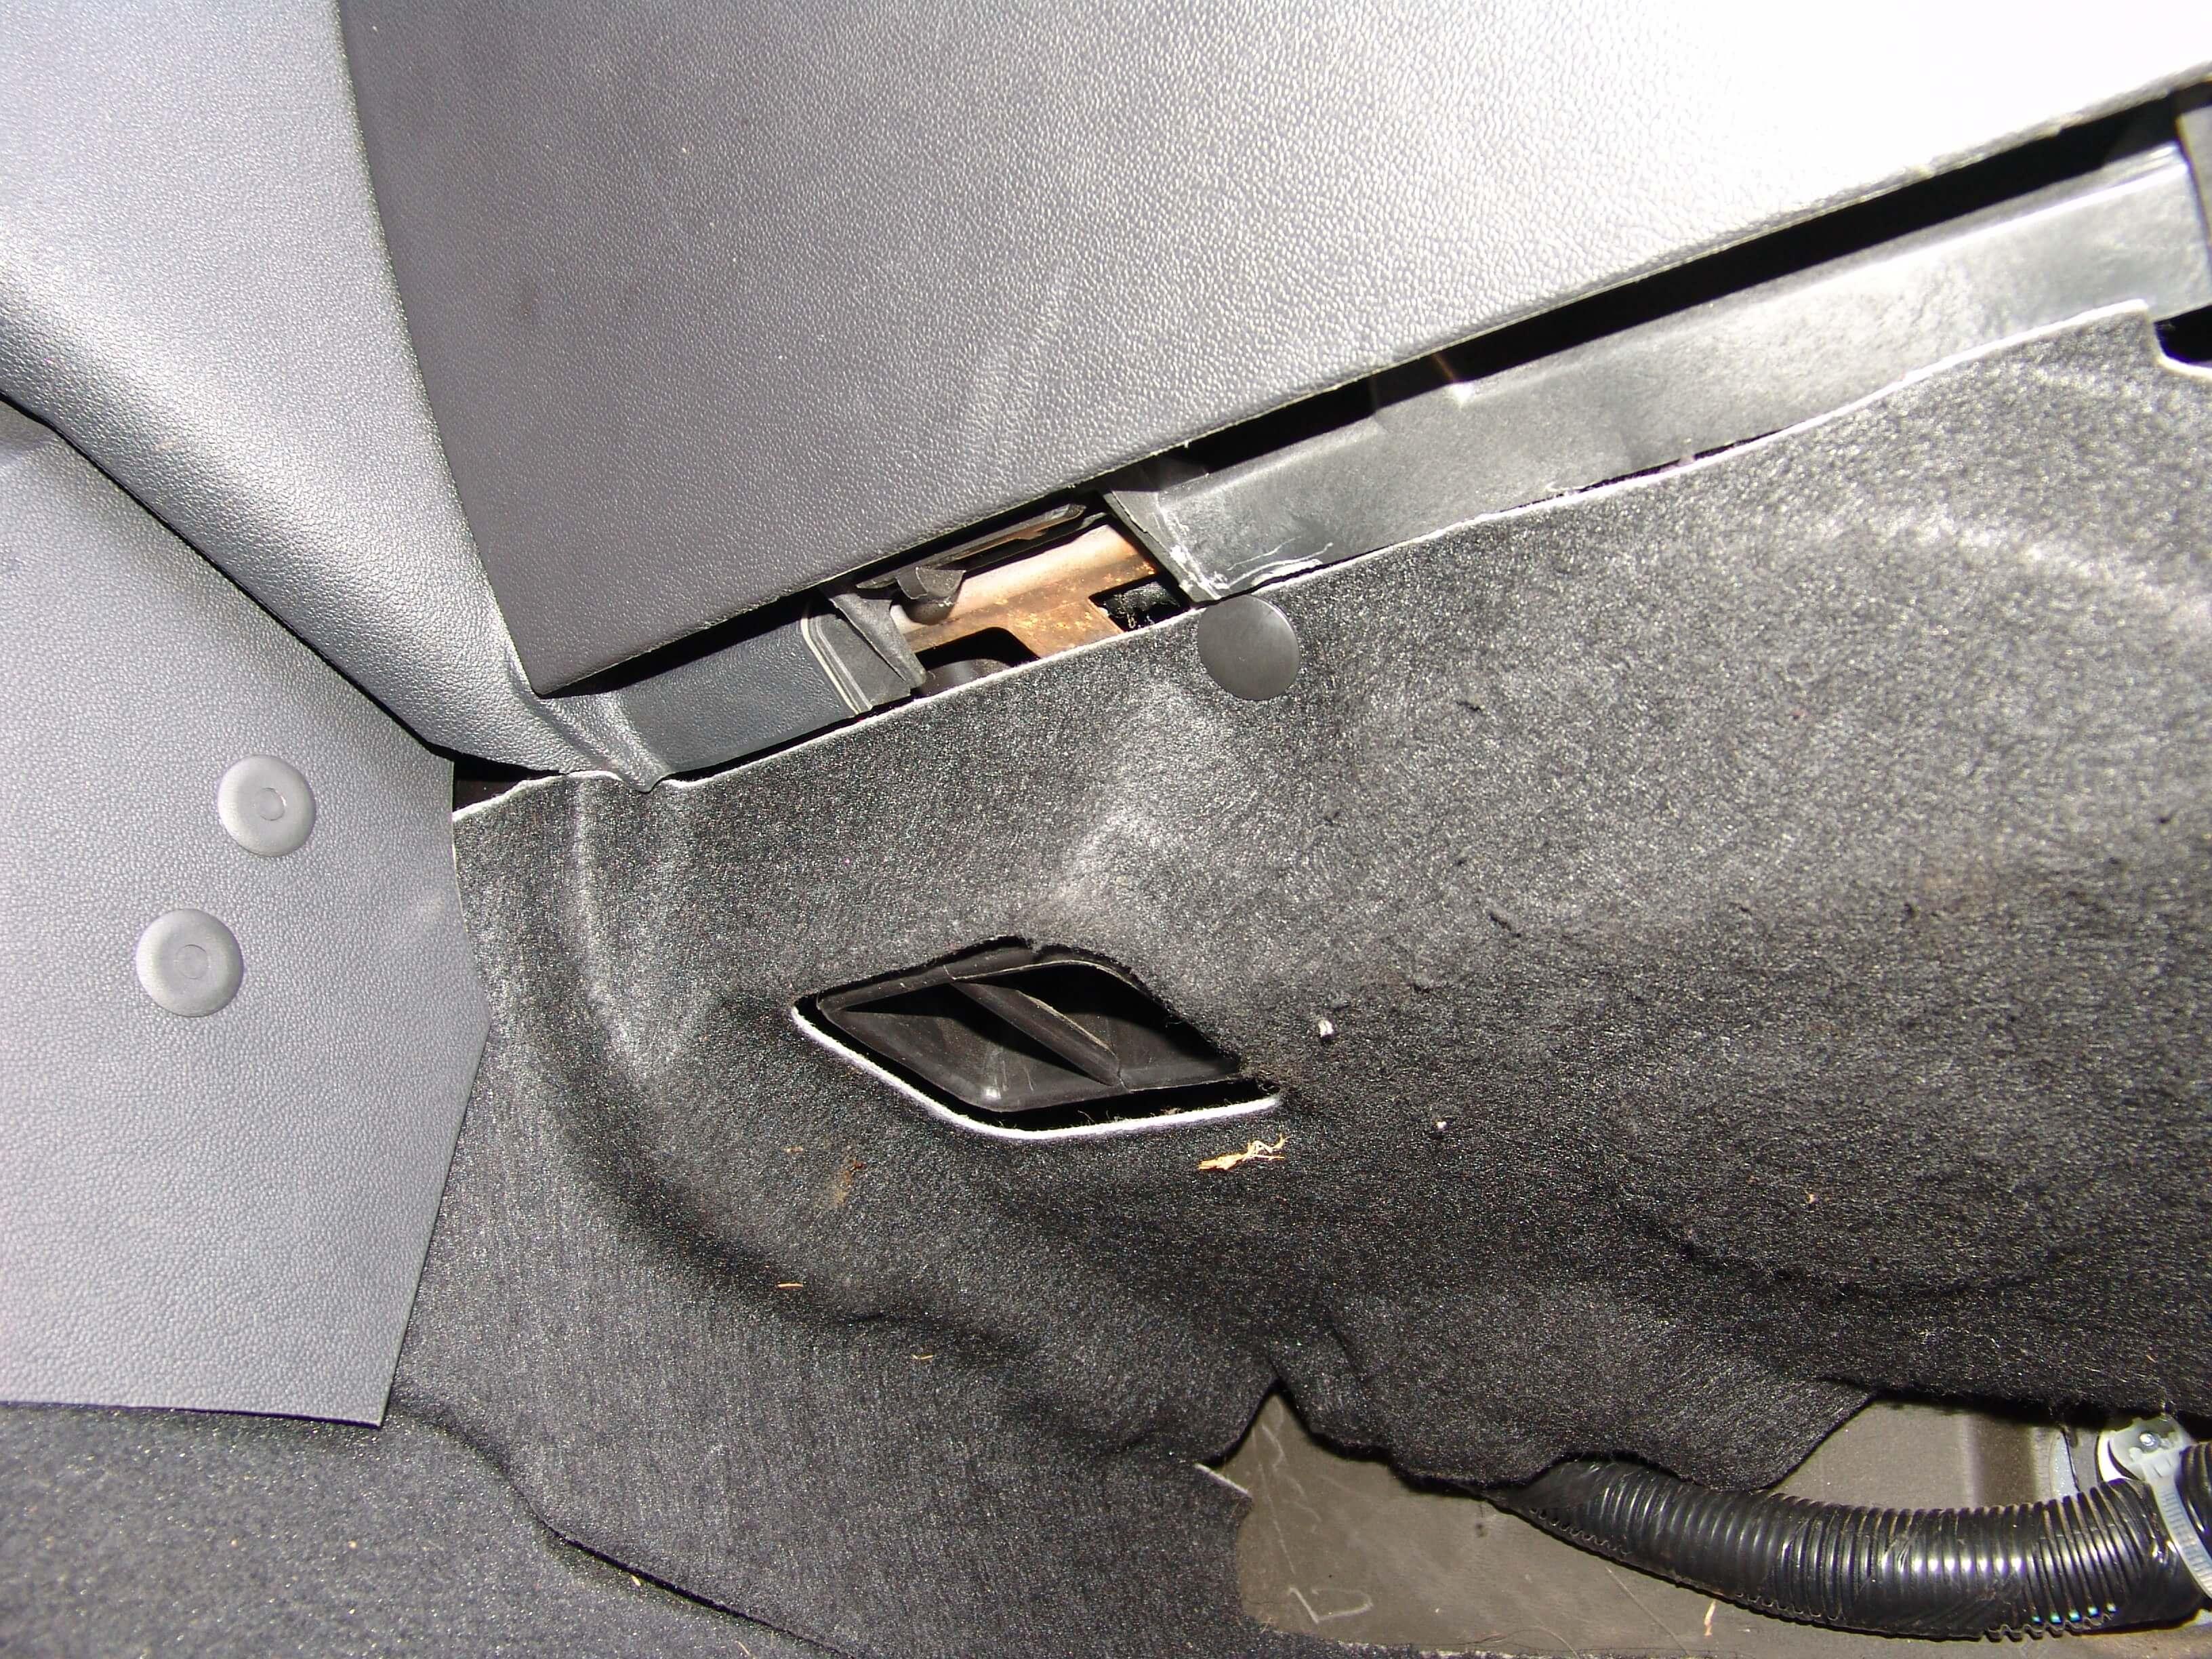 2009 Dodge Journey Interior Fuse Box Location efcaviation – Dodge Journey Interior Fuse Box